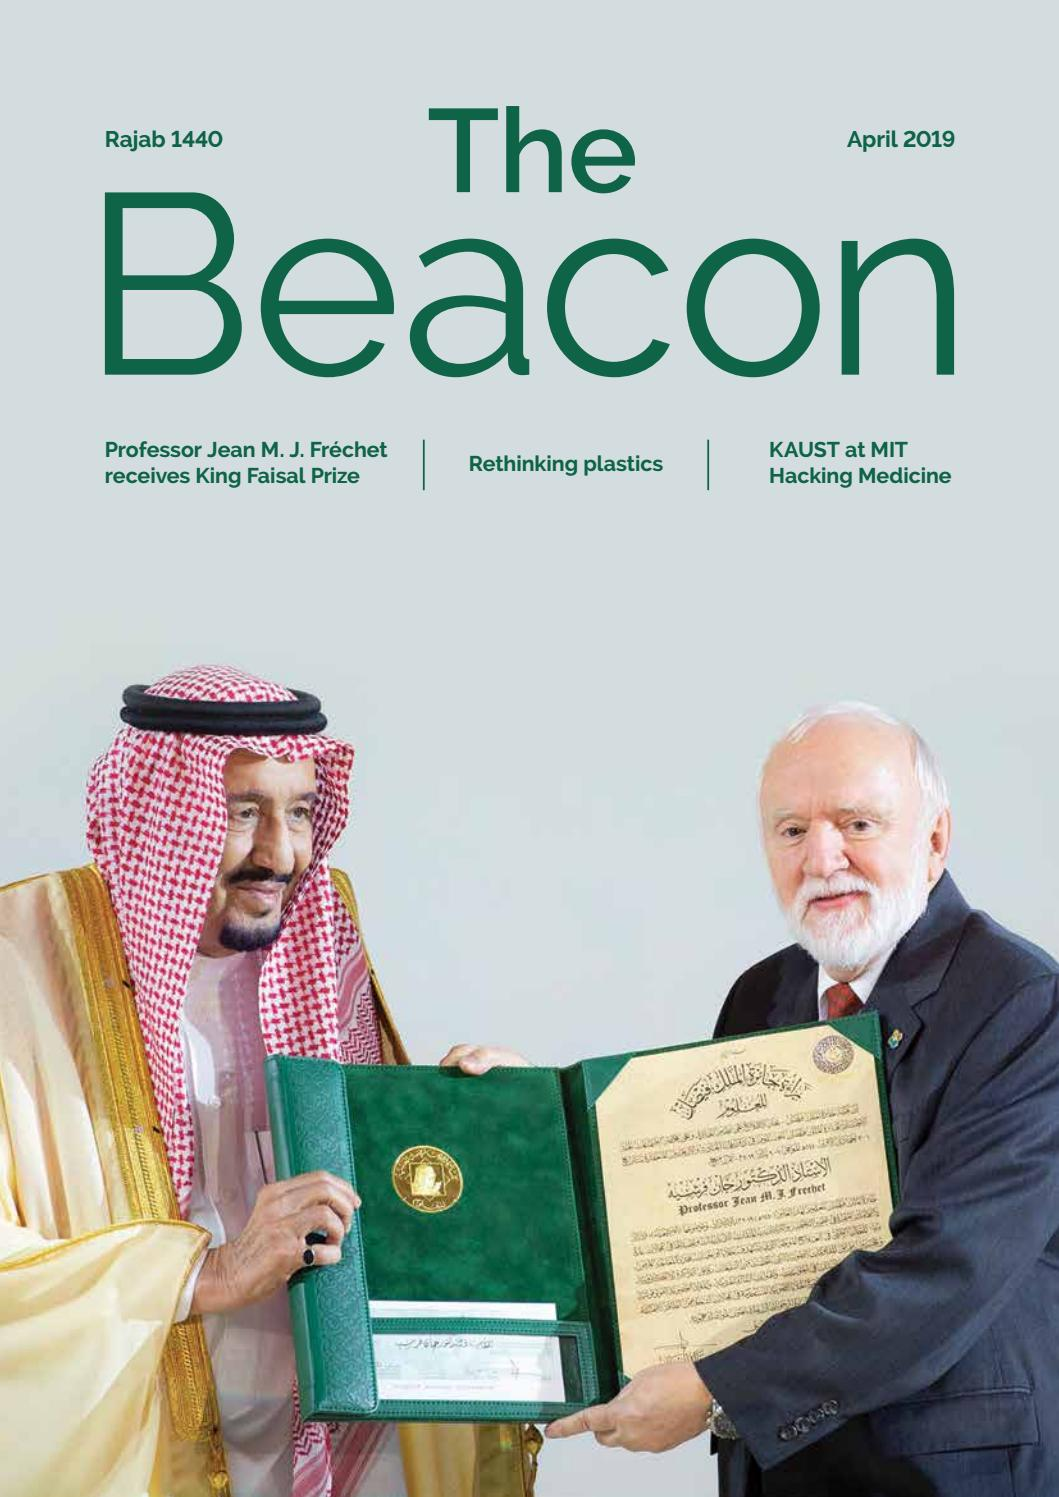 11e691db0100f 2019 April Beacon by KAUST - issuu